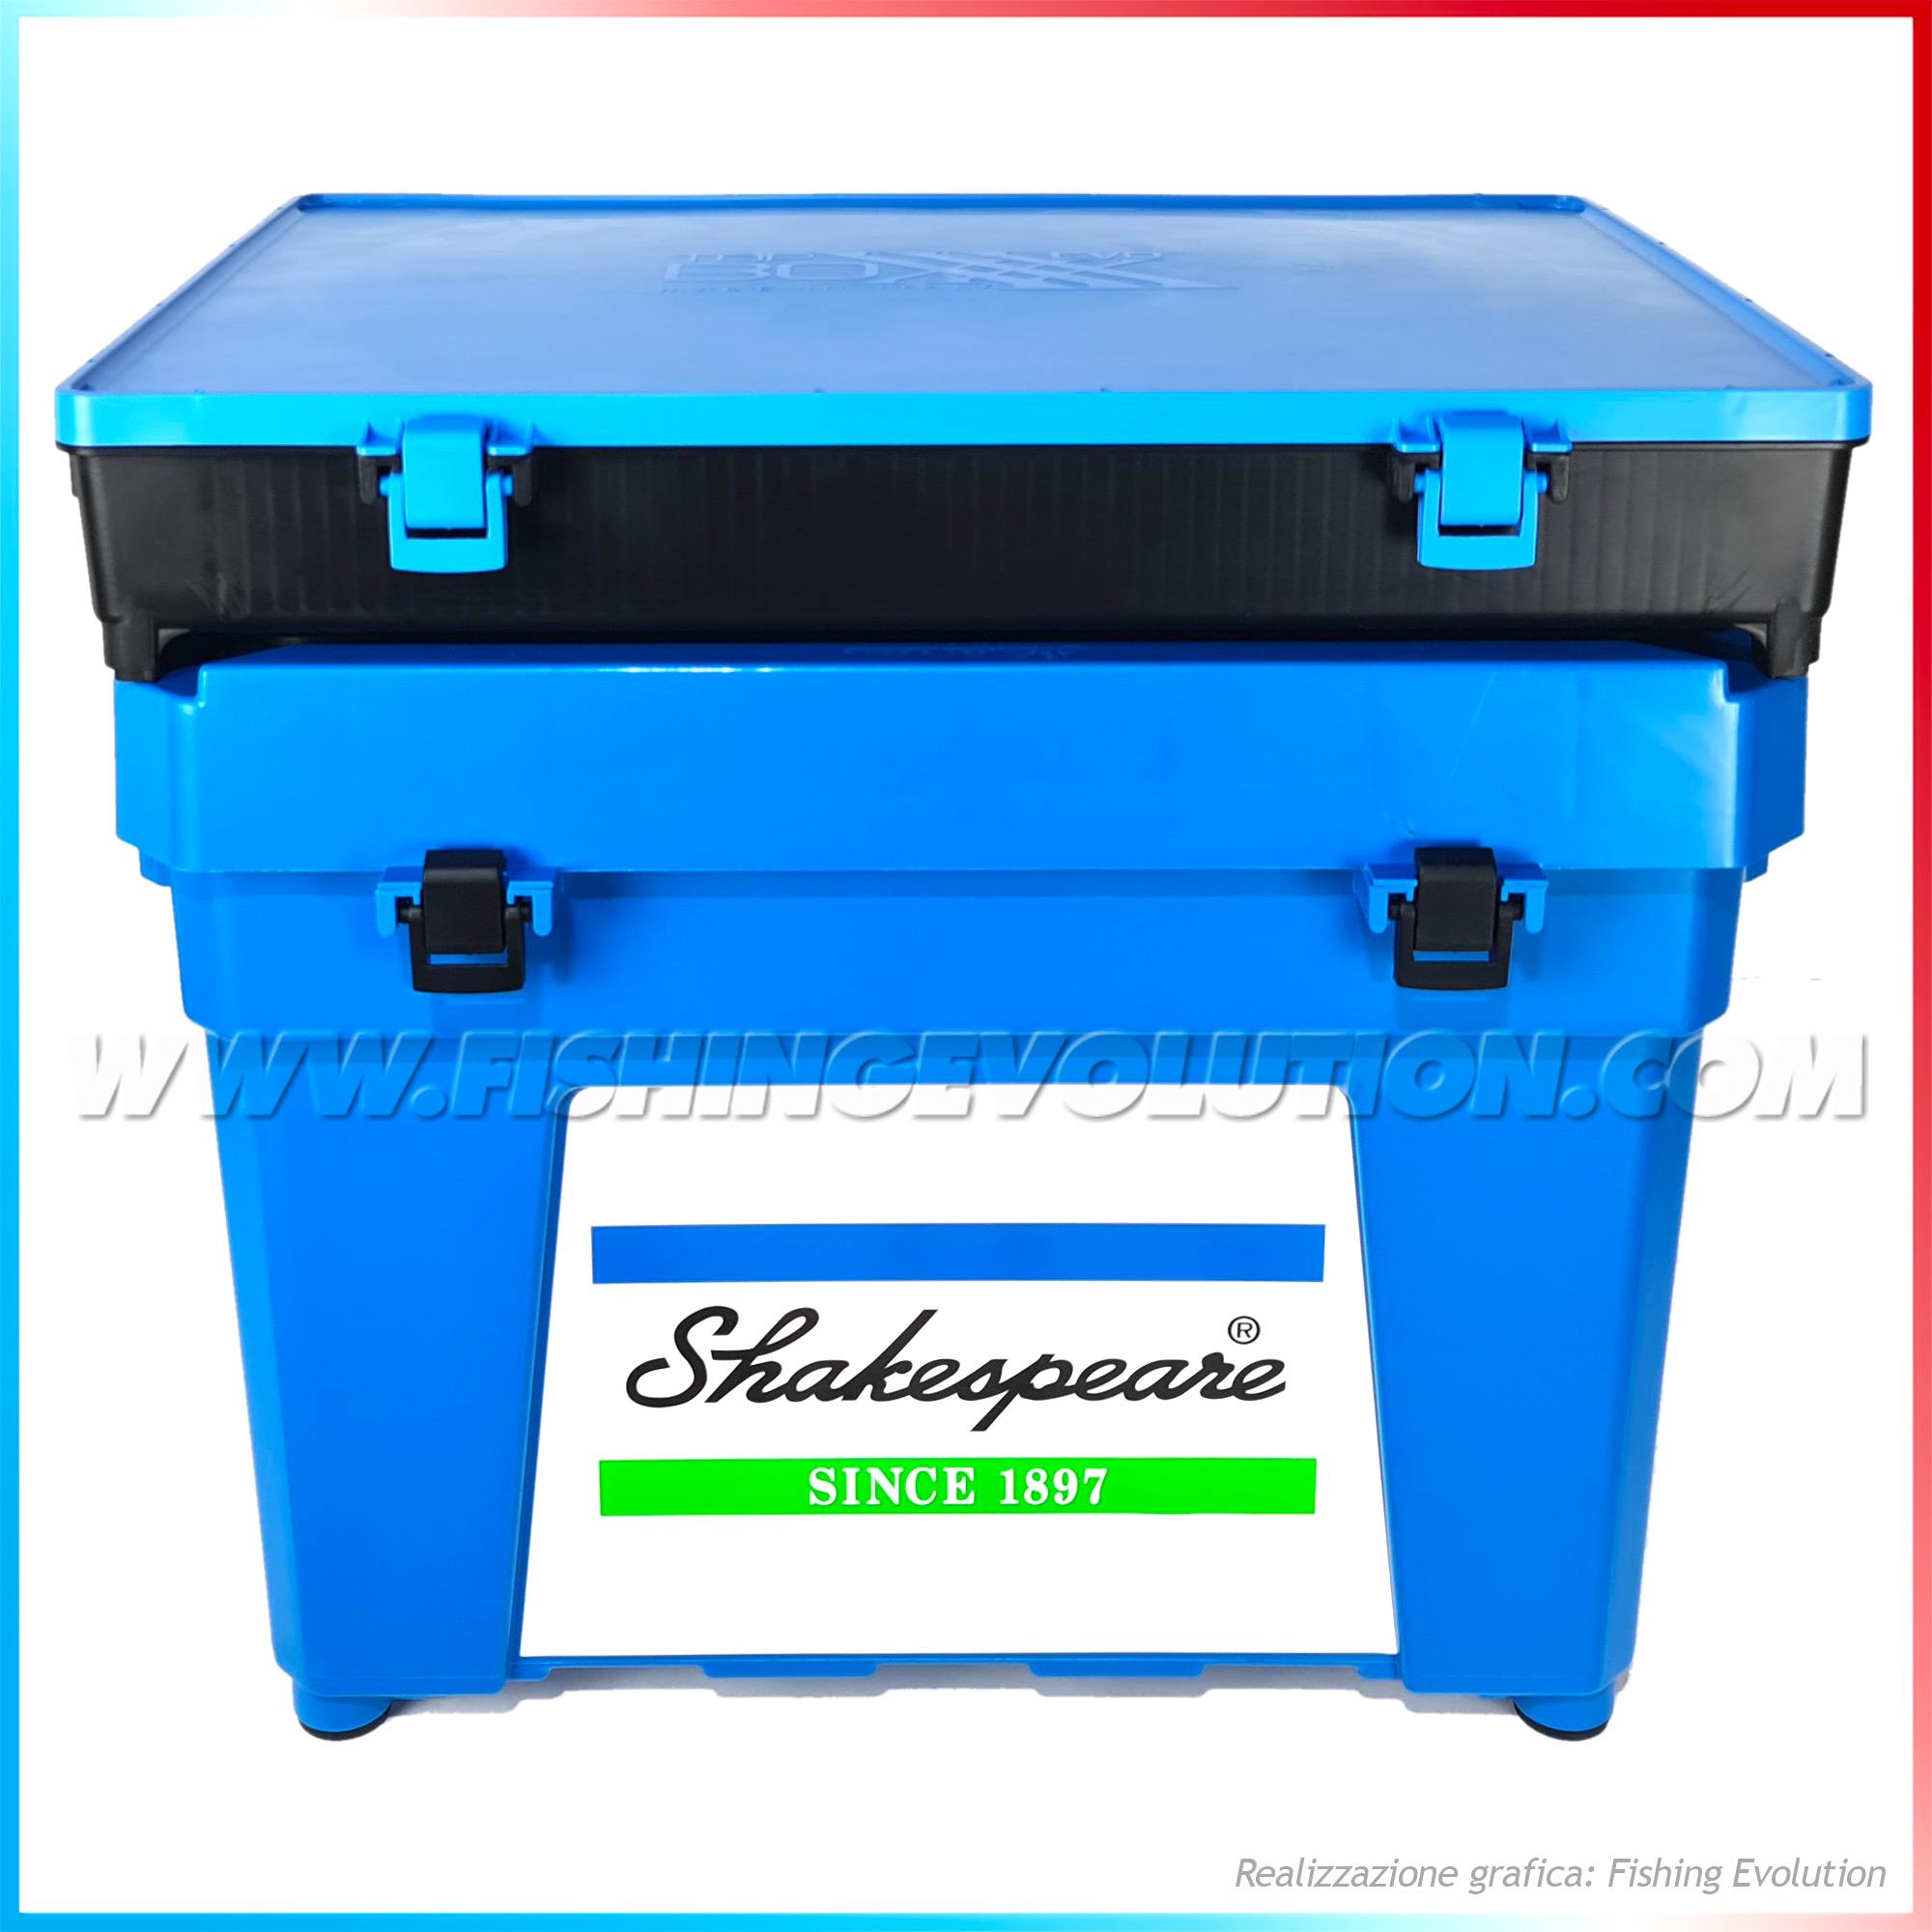 SkpBluTboxxx2.jpg